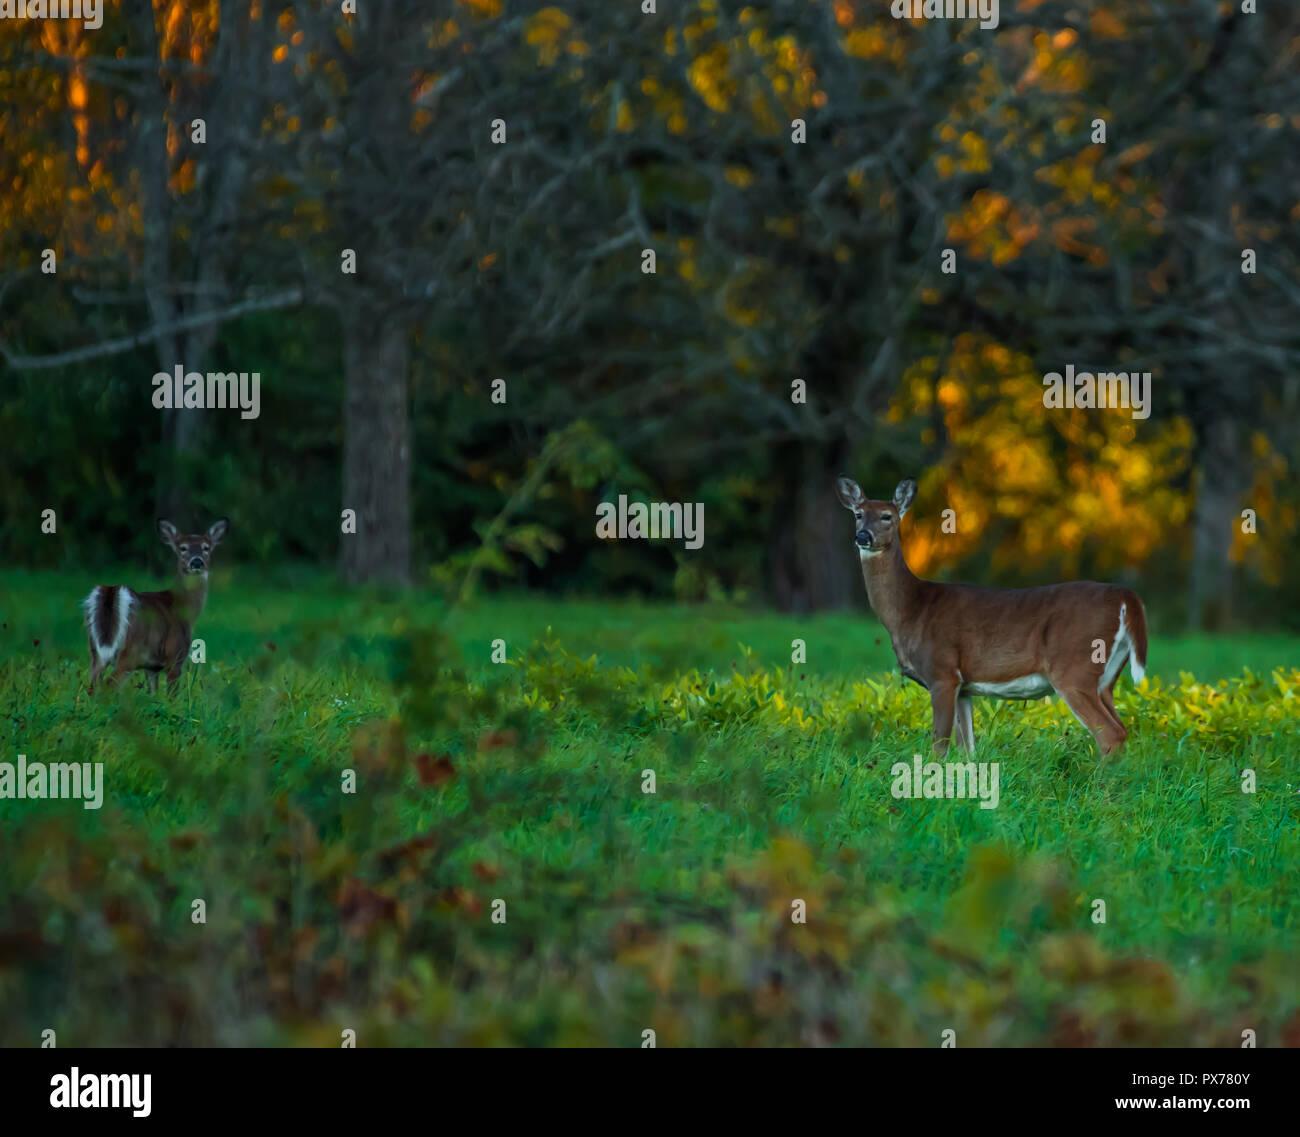 Deer in the Evening Sun - Stock Image